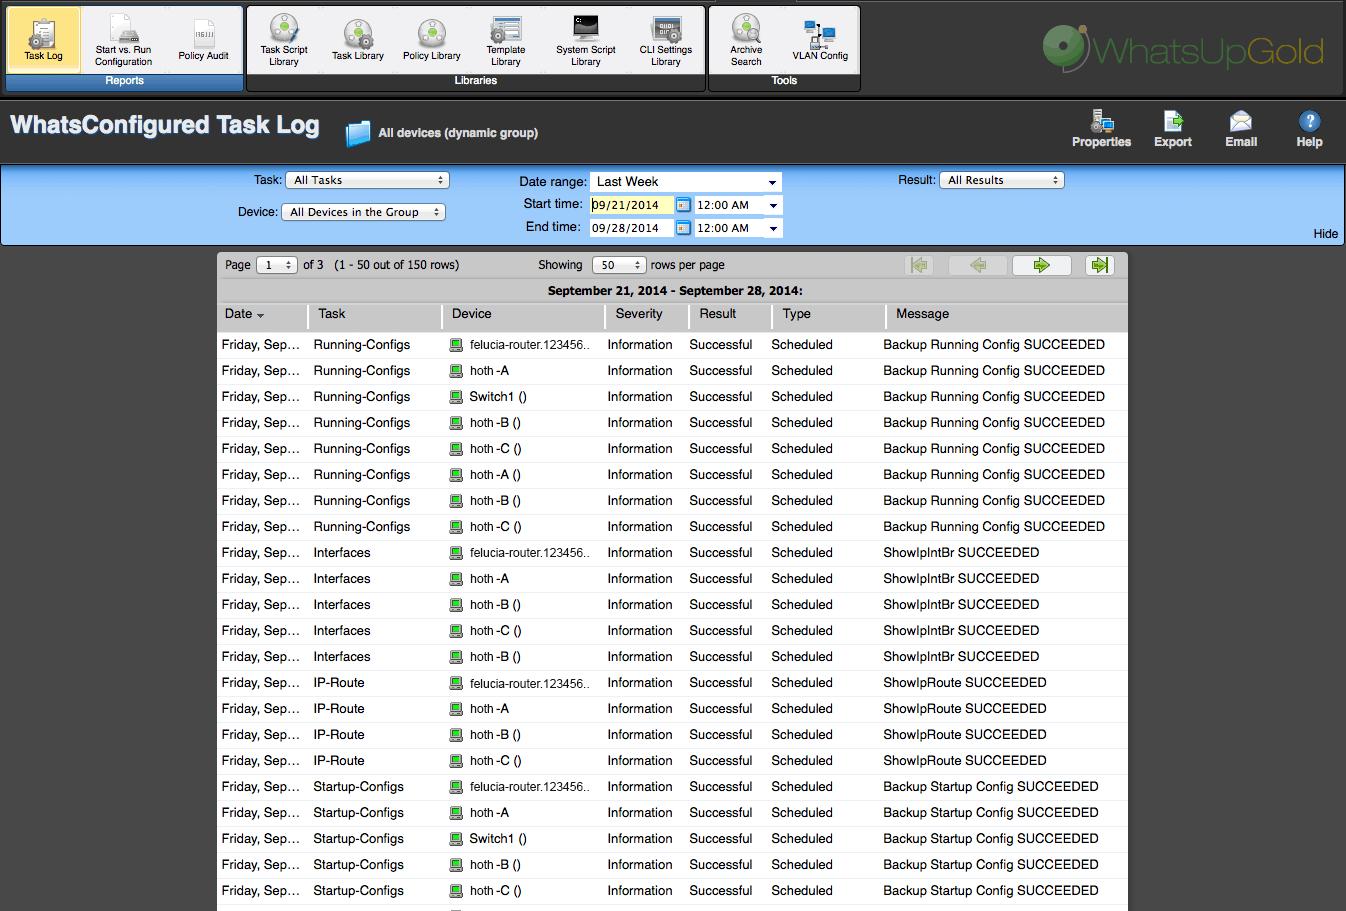 WhatsUp Gold Configuraiton Manager Task Log